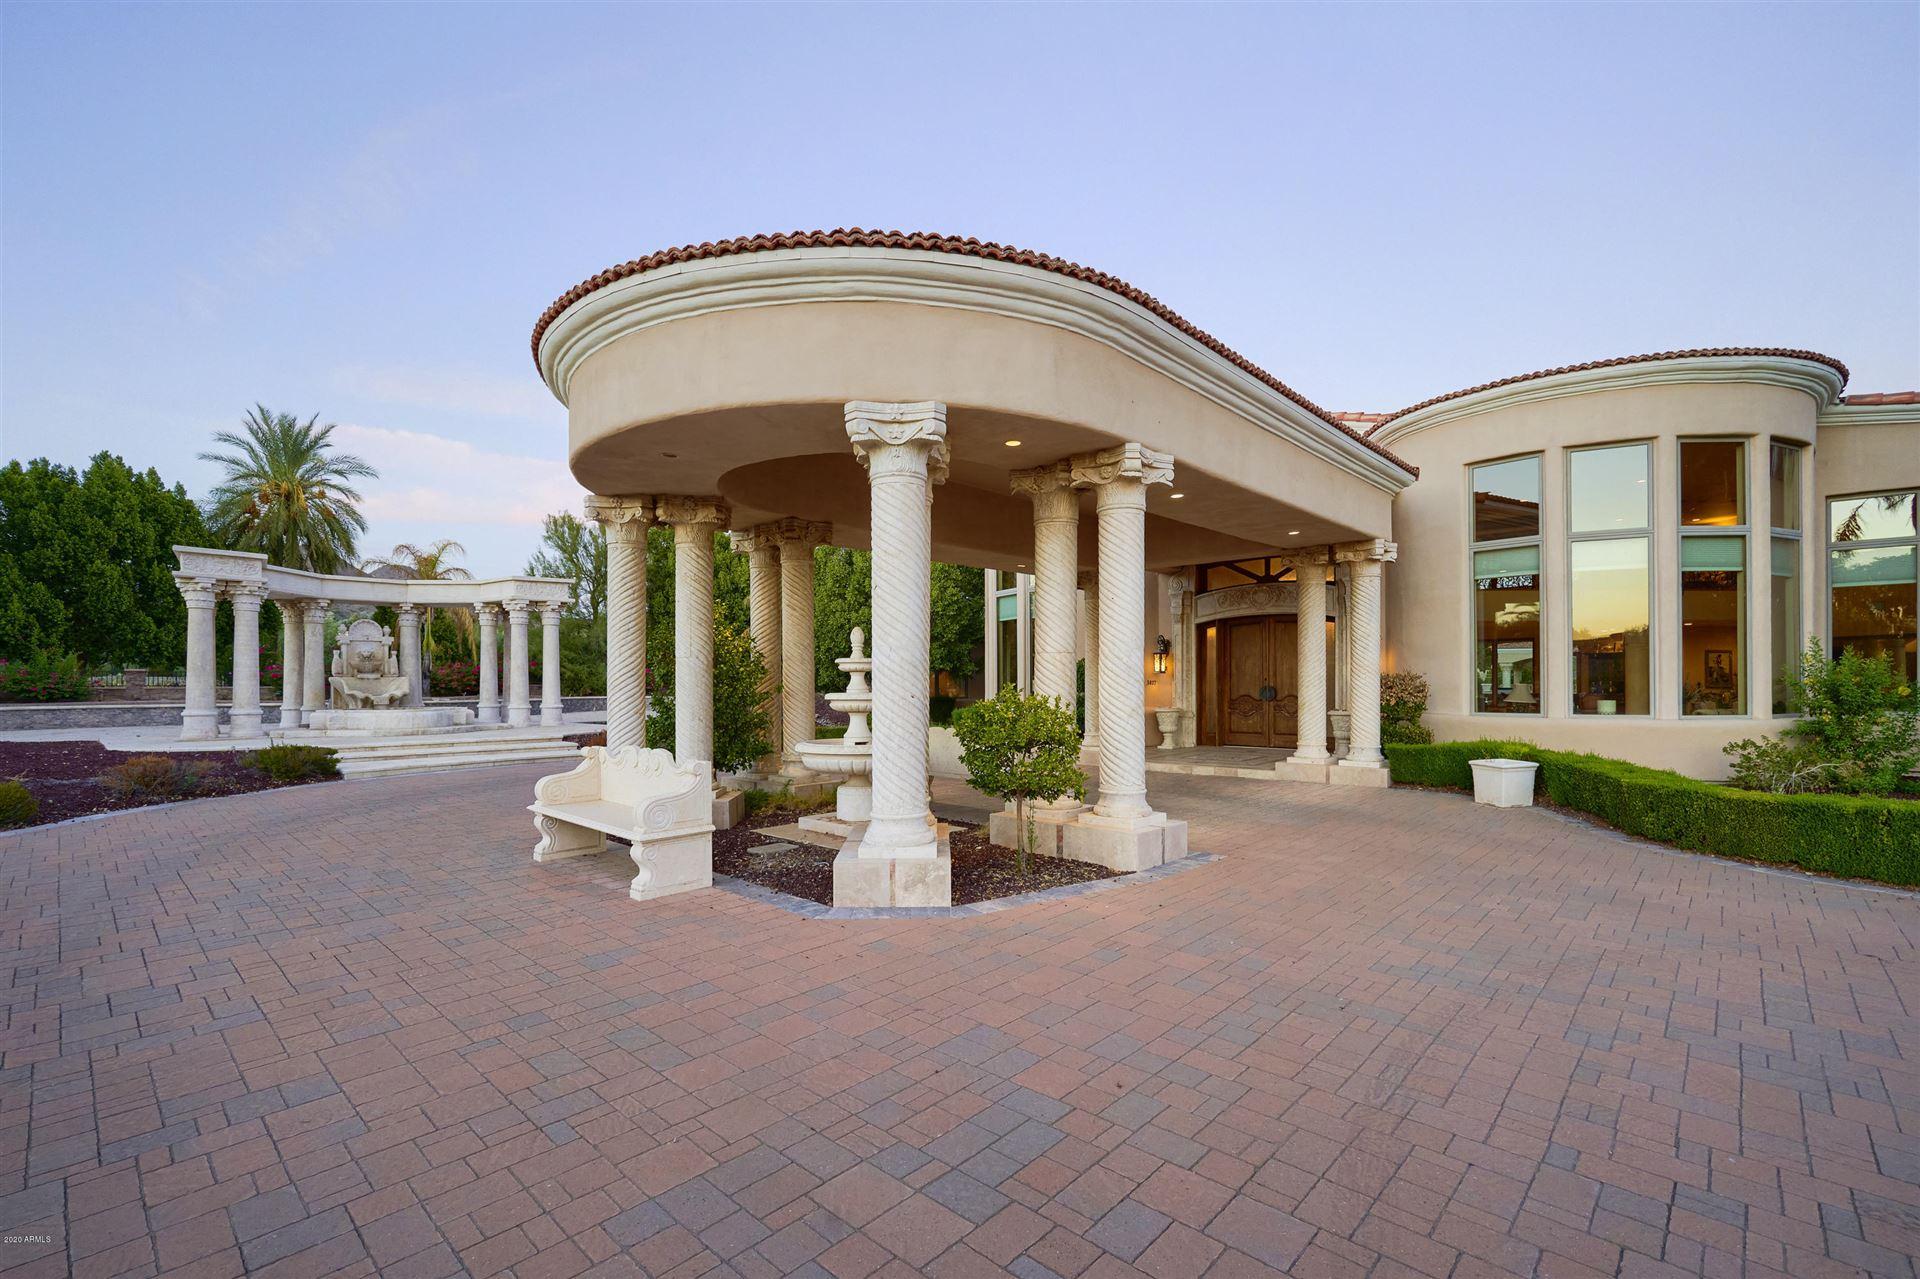 Photo of 5837 N Palo Cristi Road, Paradise Valley, AZ 85253 (MLS # 6148731)